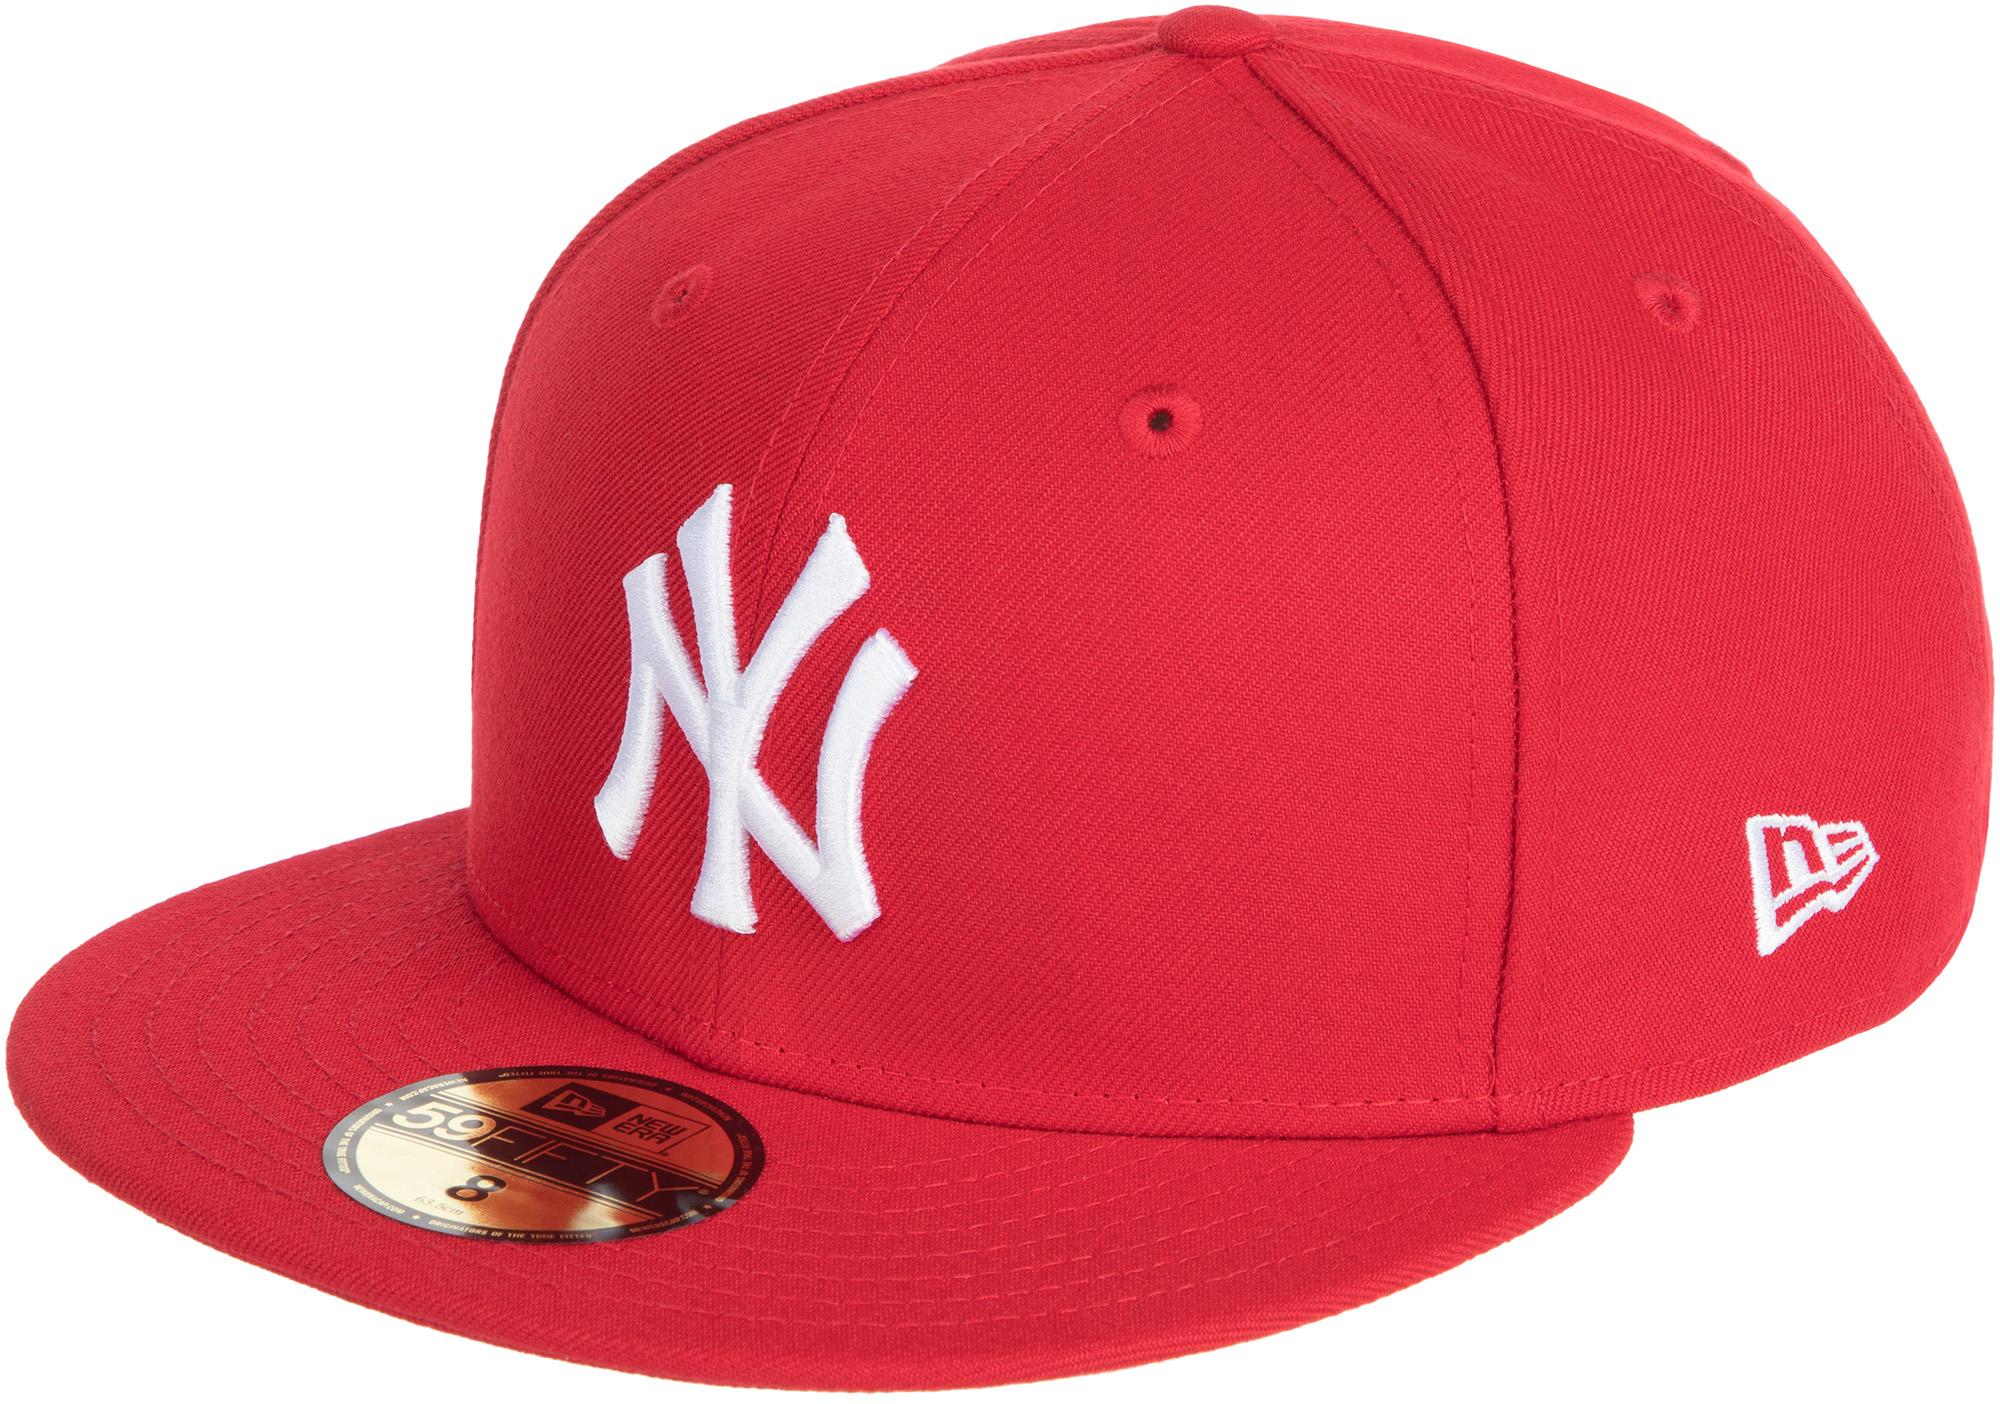 New Era Бейсболка New Era MLB NY Yankees, размер 62 головной убор new era 59fifty los angeles dodgers mlb